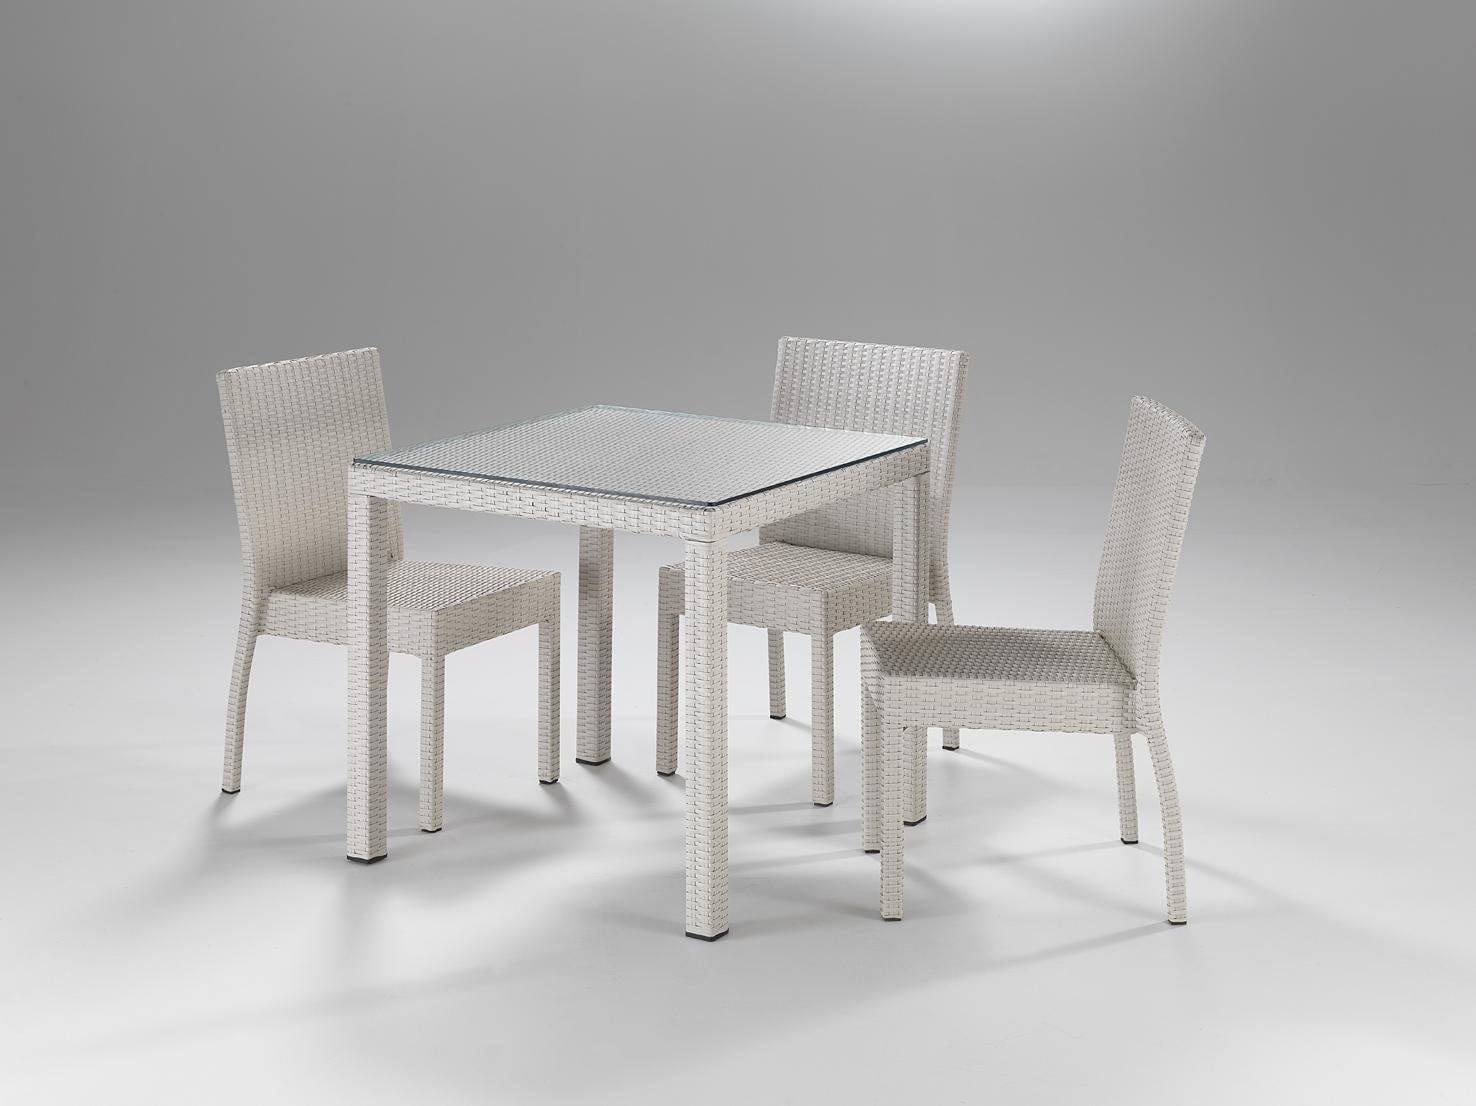 Tavolo quadrato Bianco - Etnico Outlet Mobili Etnici